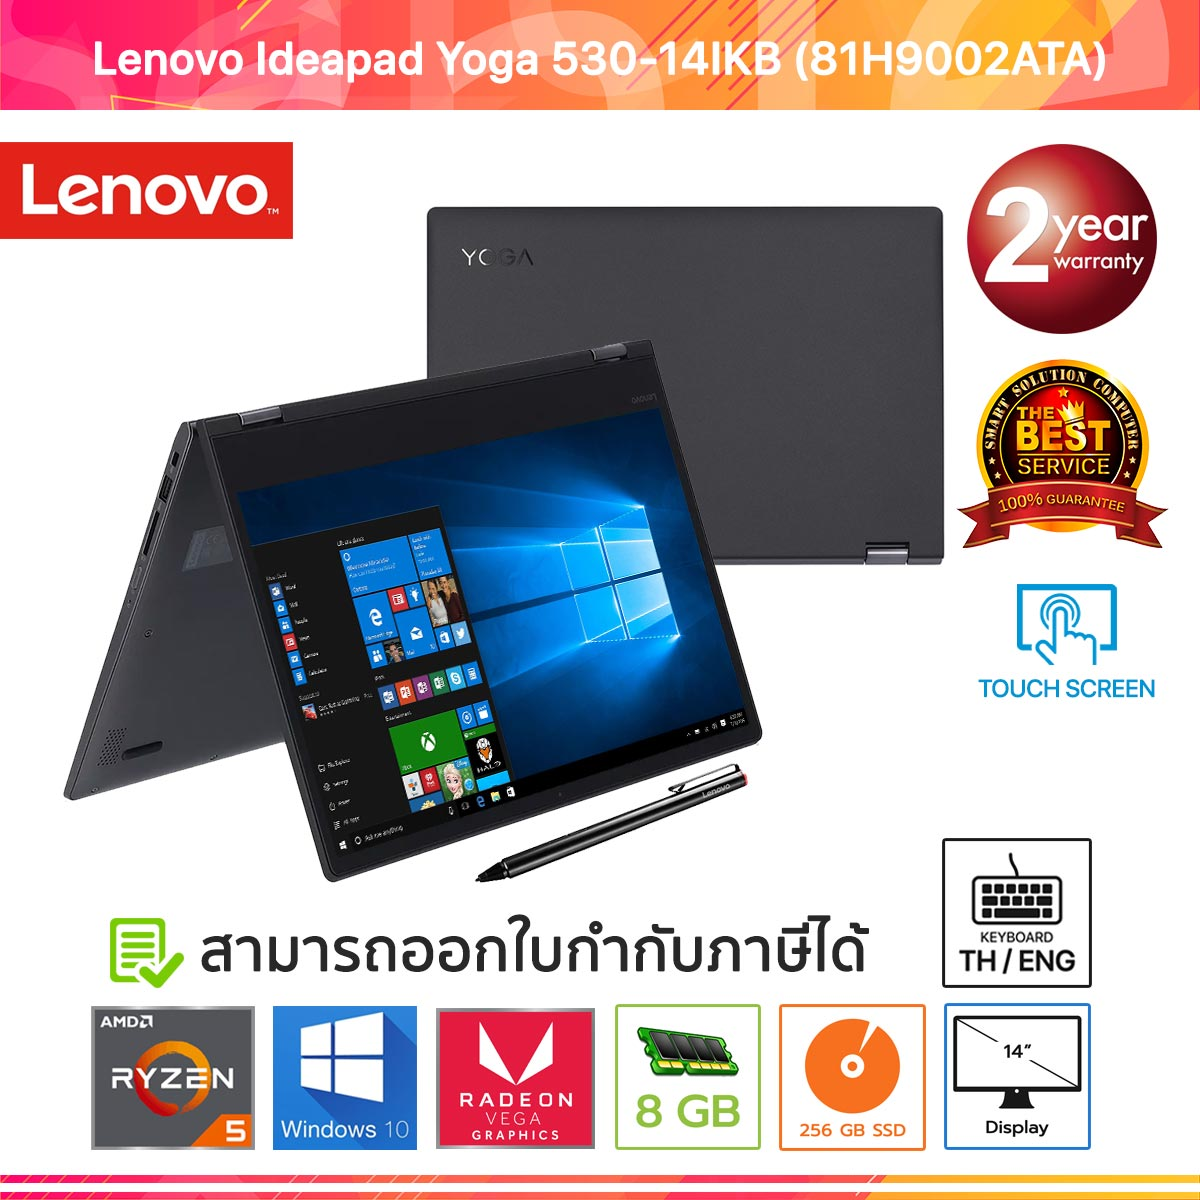 Lenovo Ideapad Yoga 530-14IKB (81H9002ATA) AMD Ryzen5 2500U/8GB/256GB M.2/14.0Touch/Win10 (ฺBlack)